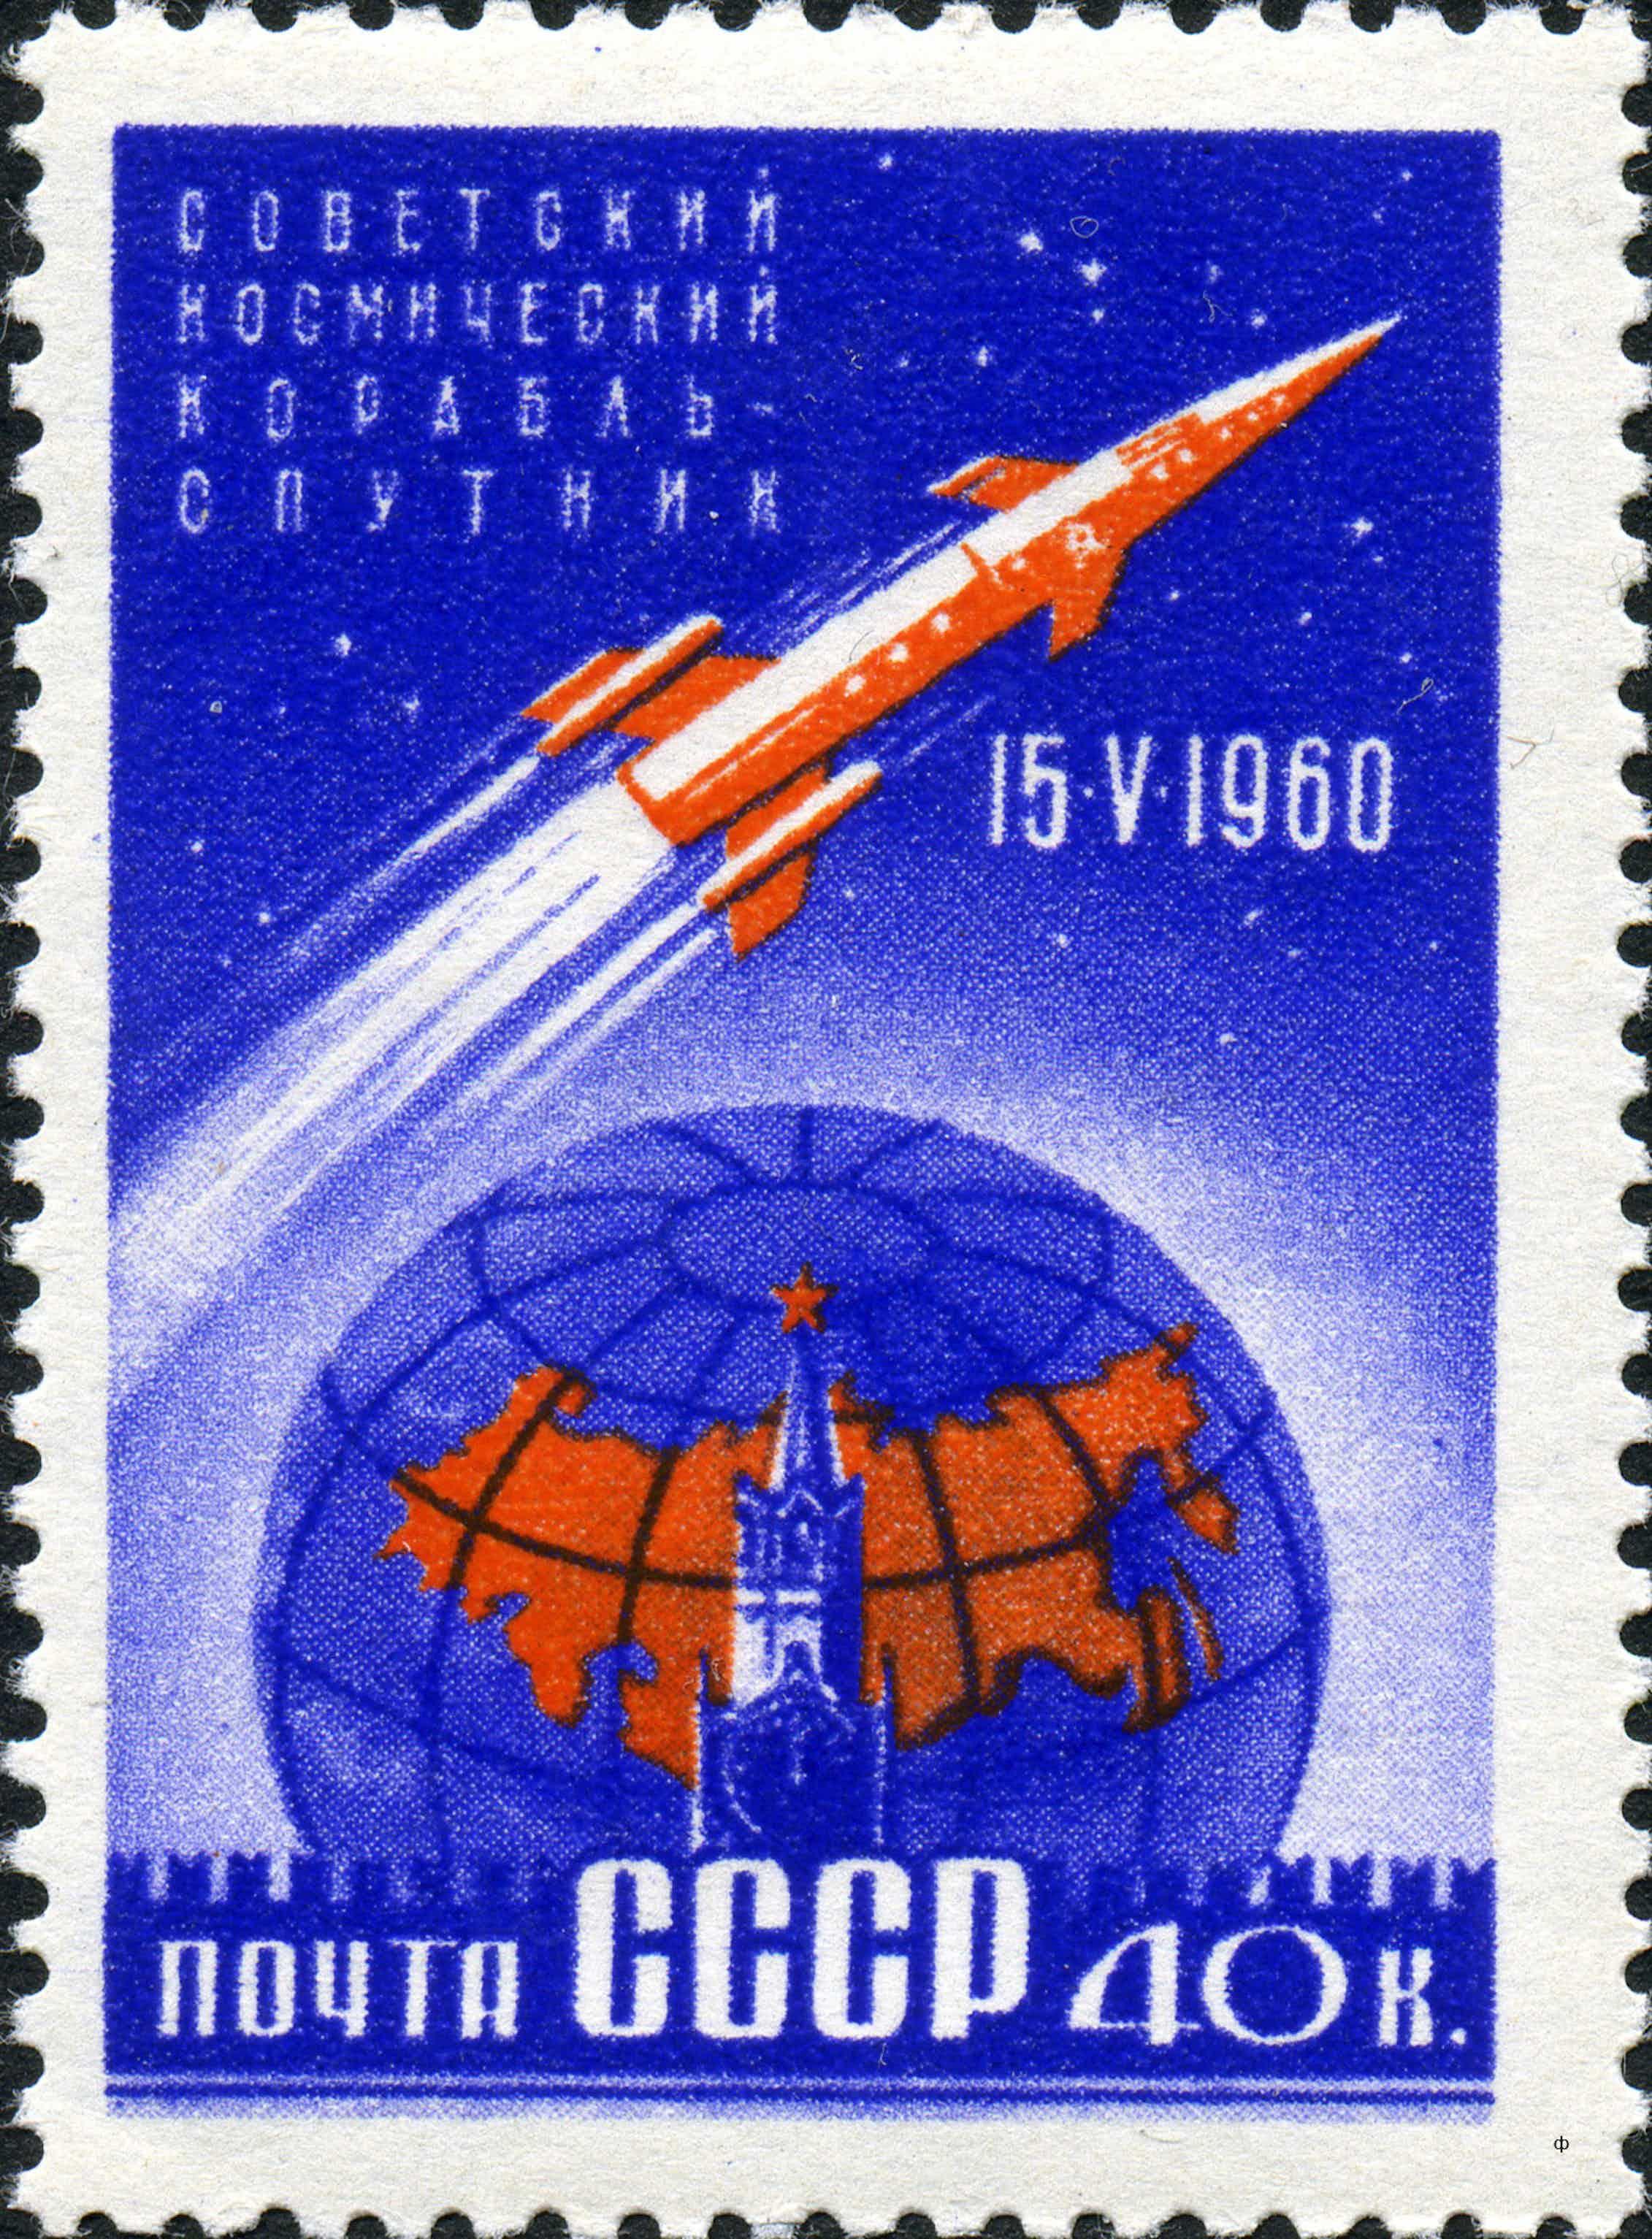 Sello postal de 1960 celebrando el liderazgo soviético en la carrera espacial.Wikimedia Commons